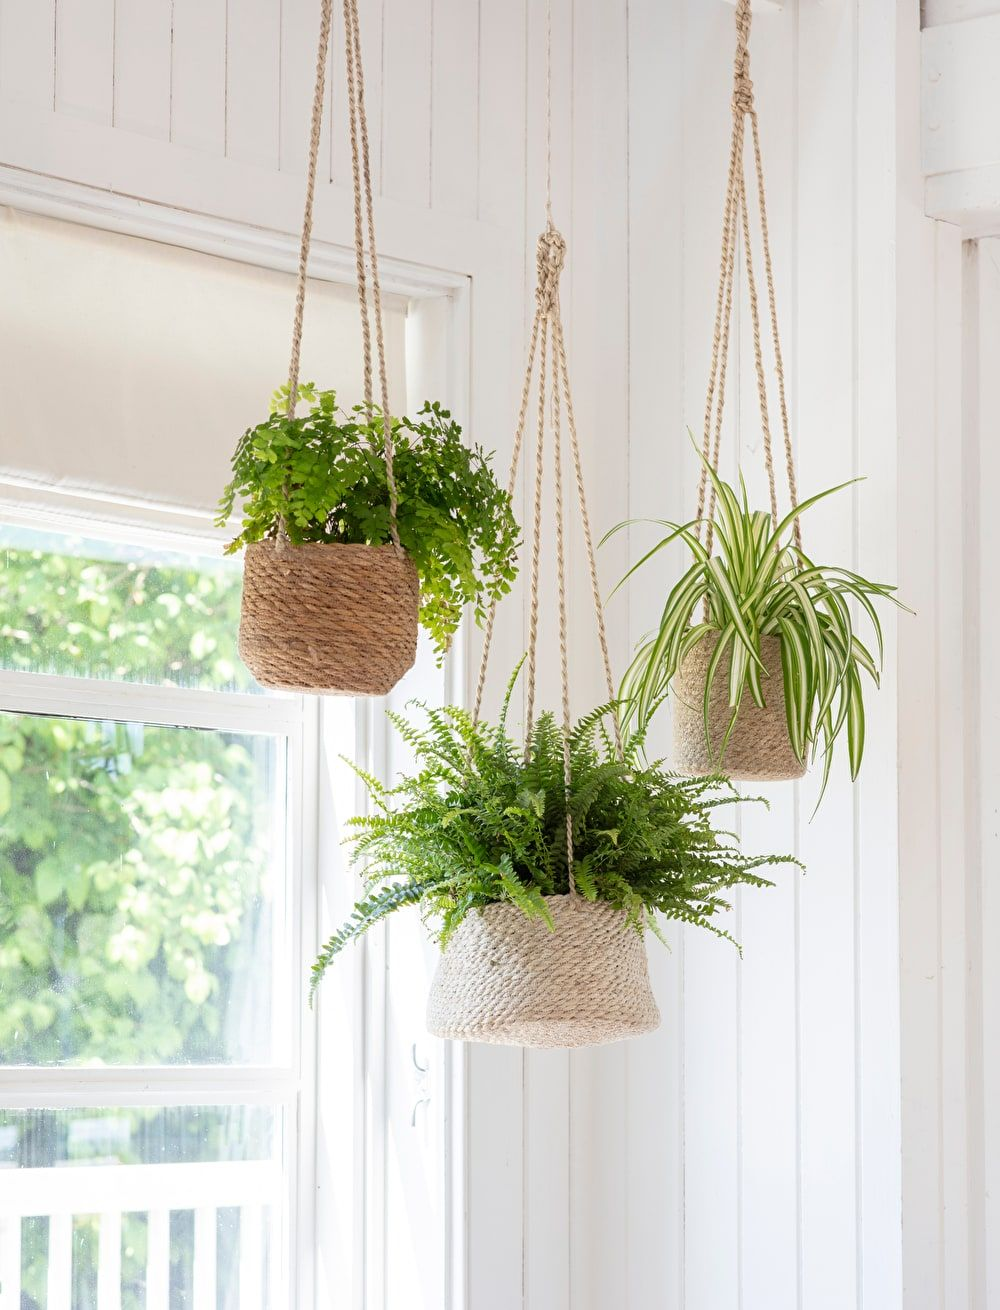 Hanging Plant Pot Hanging Plants Hanging Flower Pots Hanging